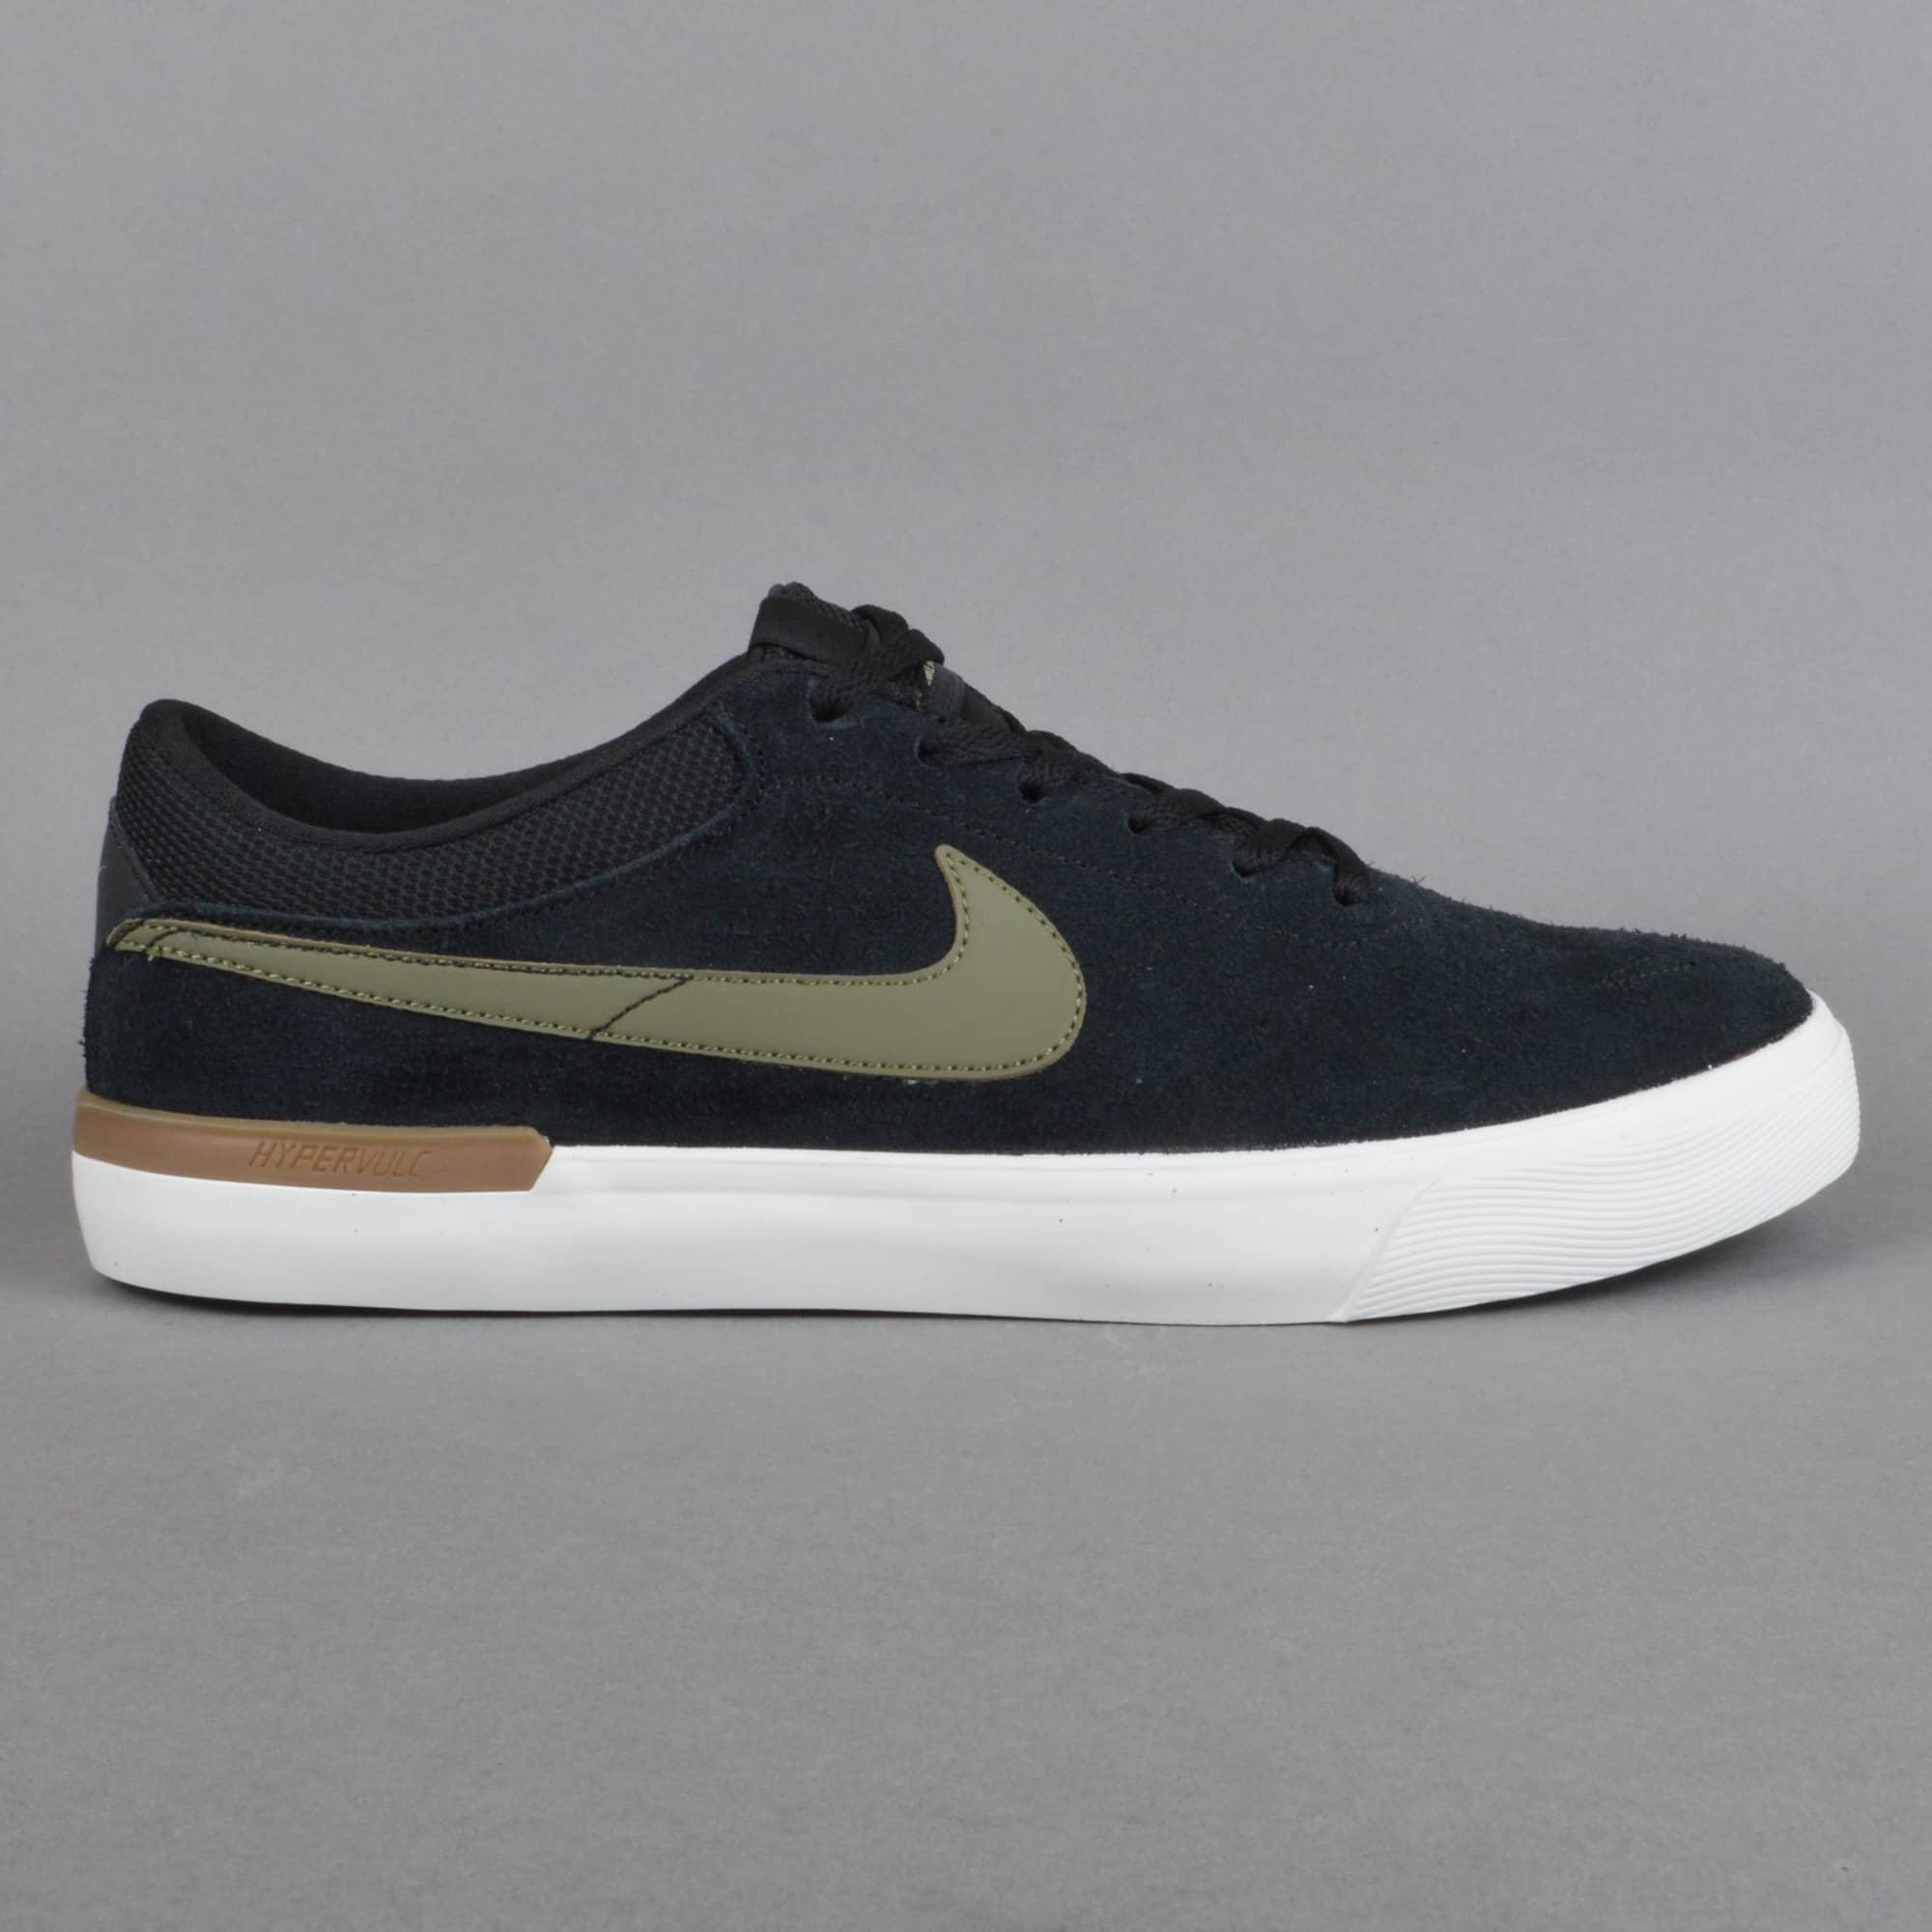 Restricciones Aburrir Centralizar  Nike SB Koston Hypervulc Skate Shoes - Black/Medium Olive - SKATE SHOES  from Native Skate Store UK